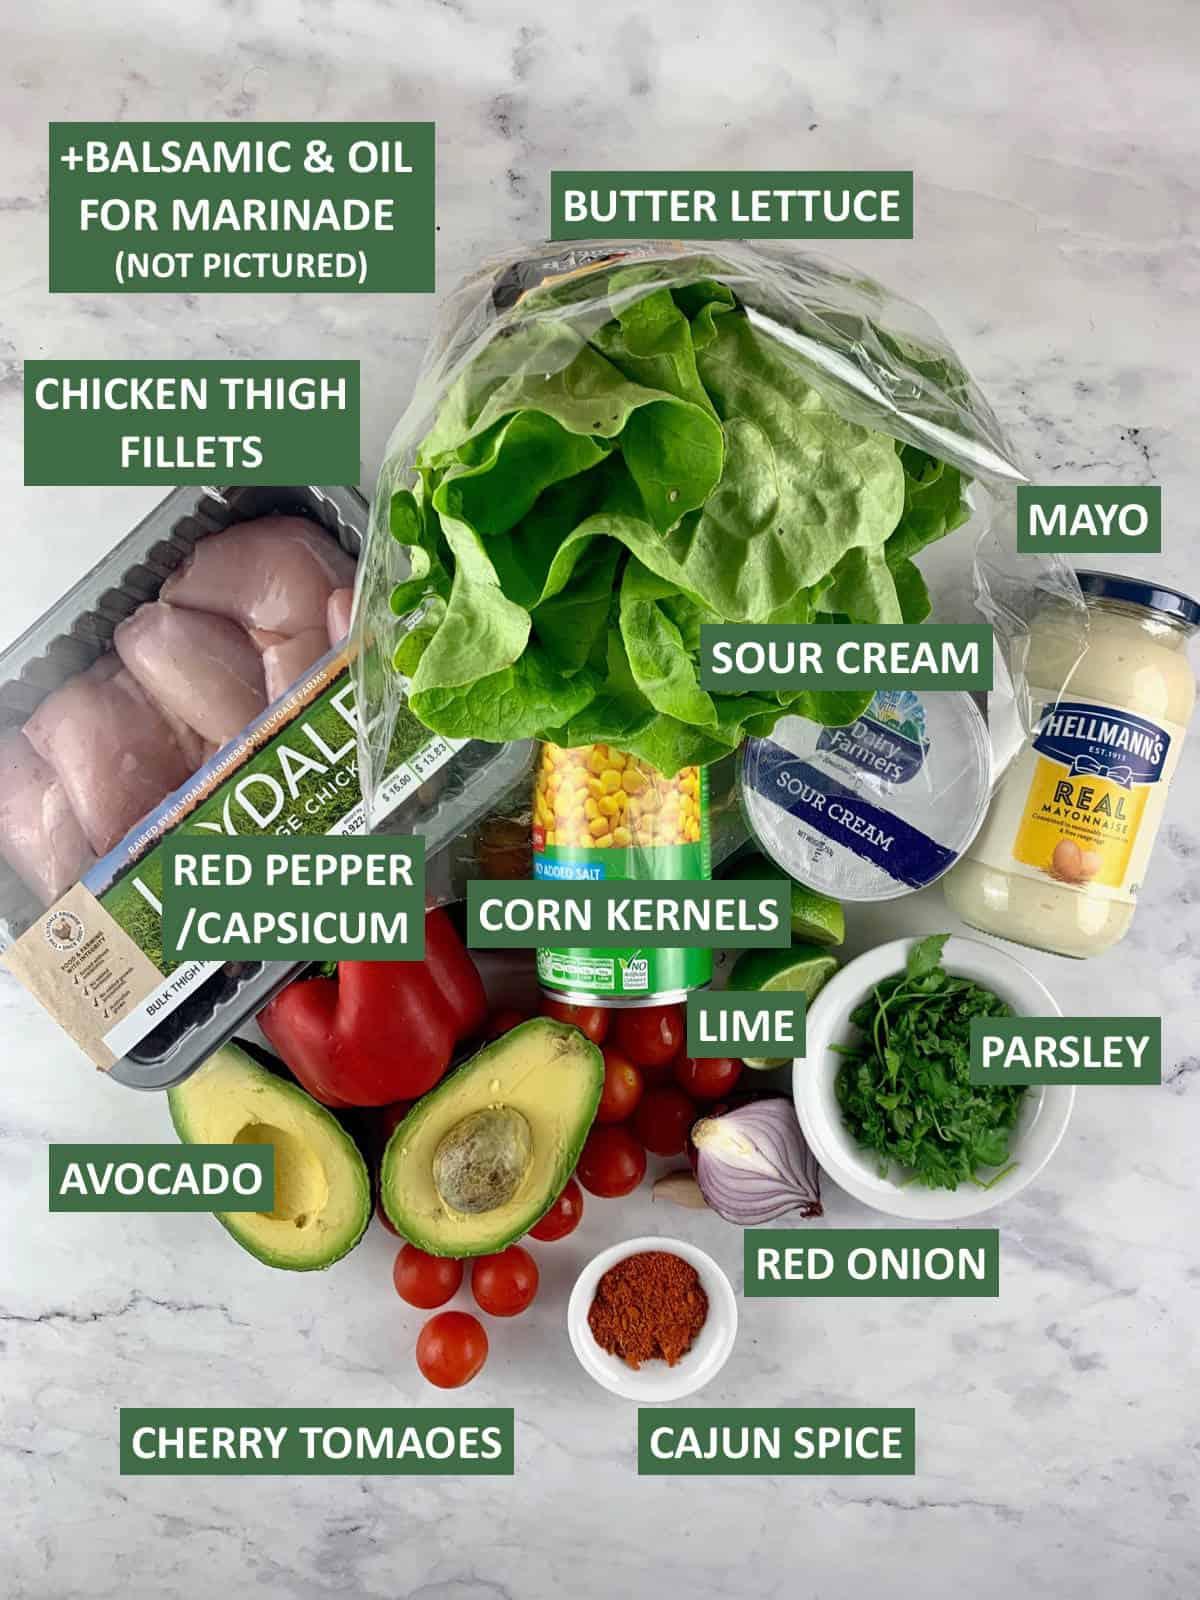 INGREDIENTS FOR MAKING CAJUN CHICKEN SALAD